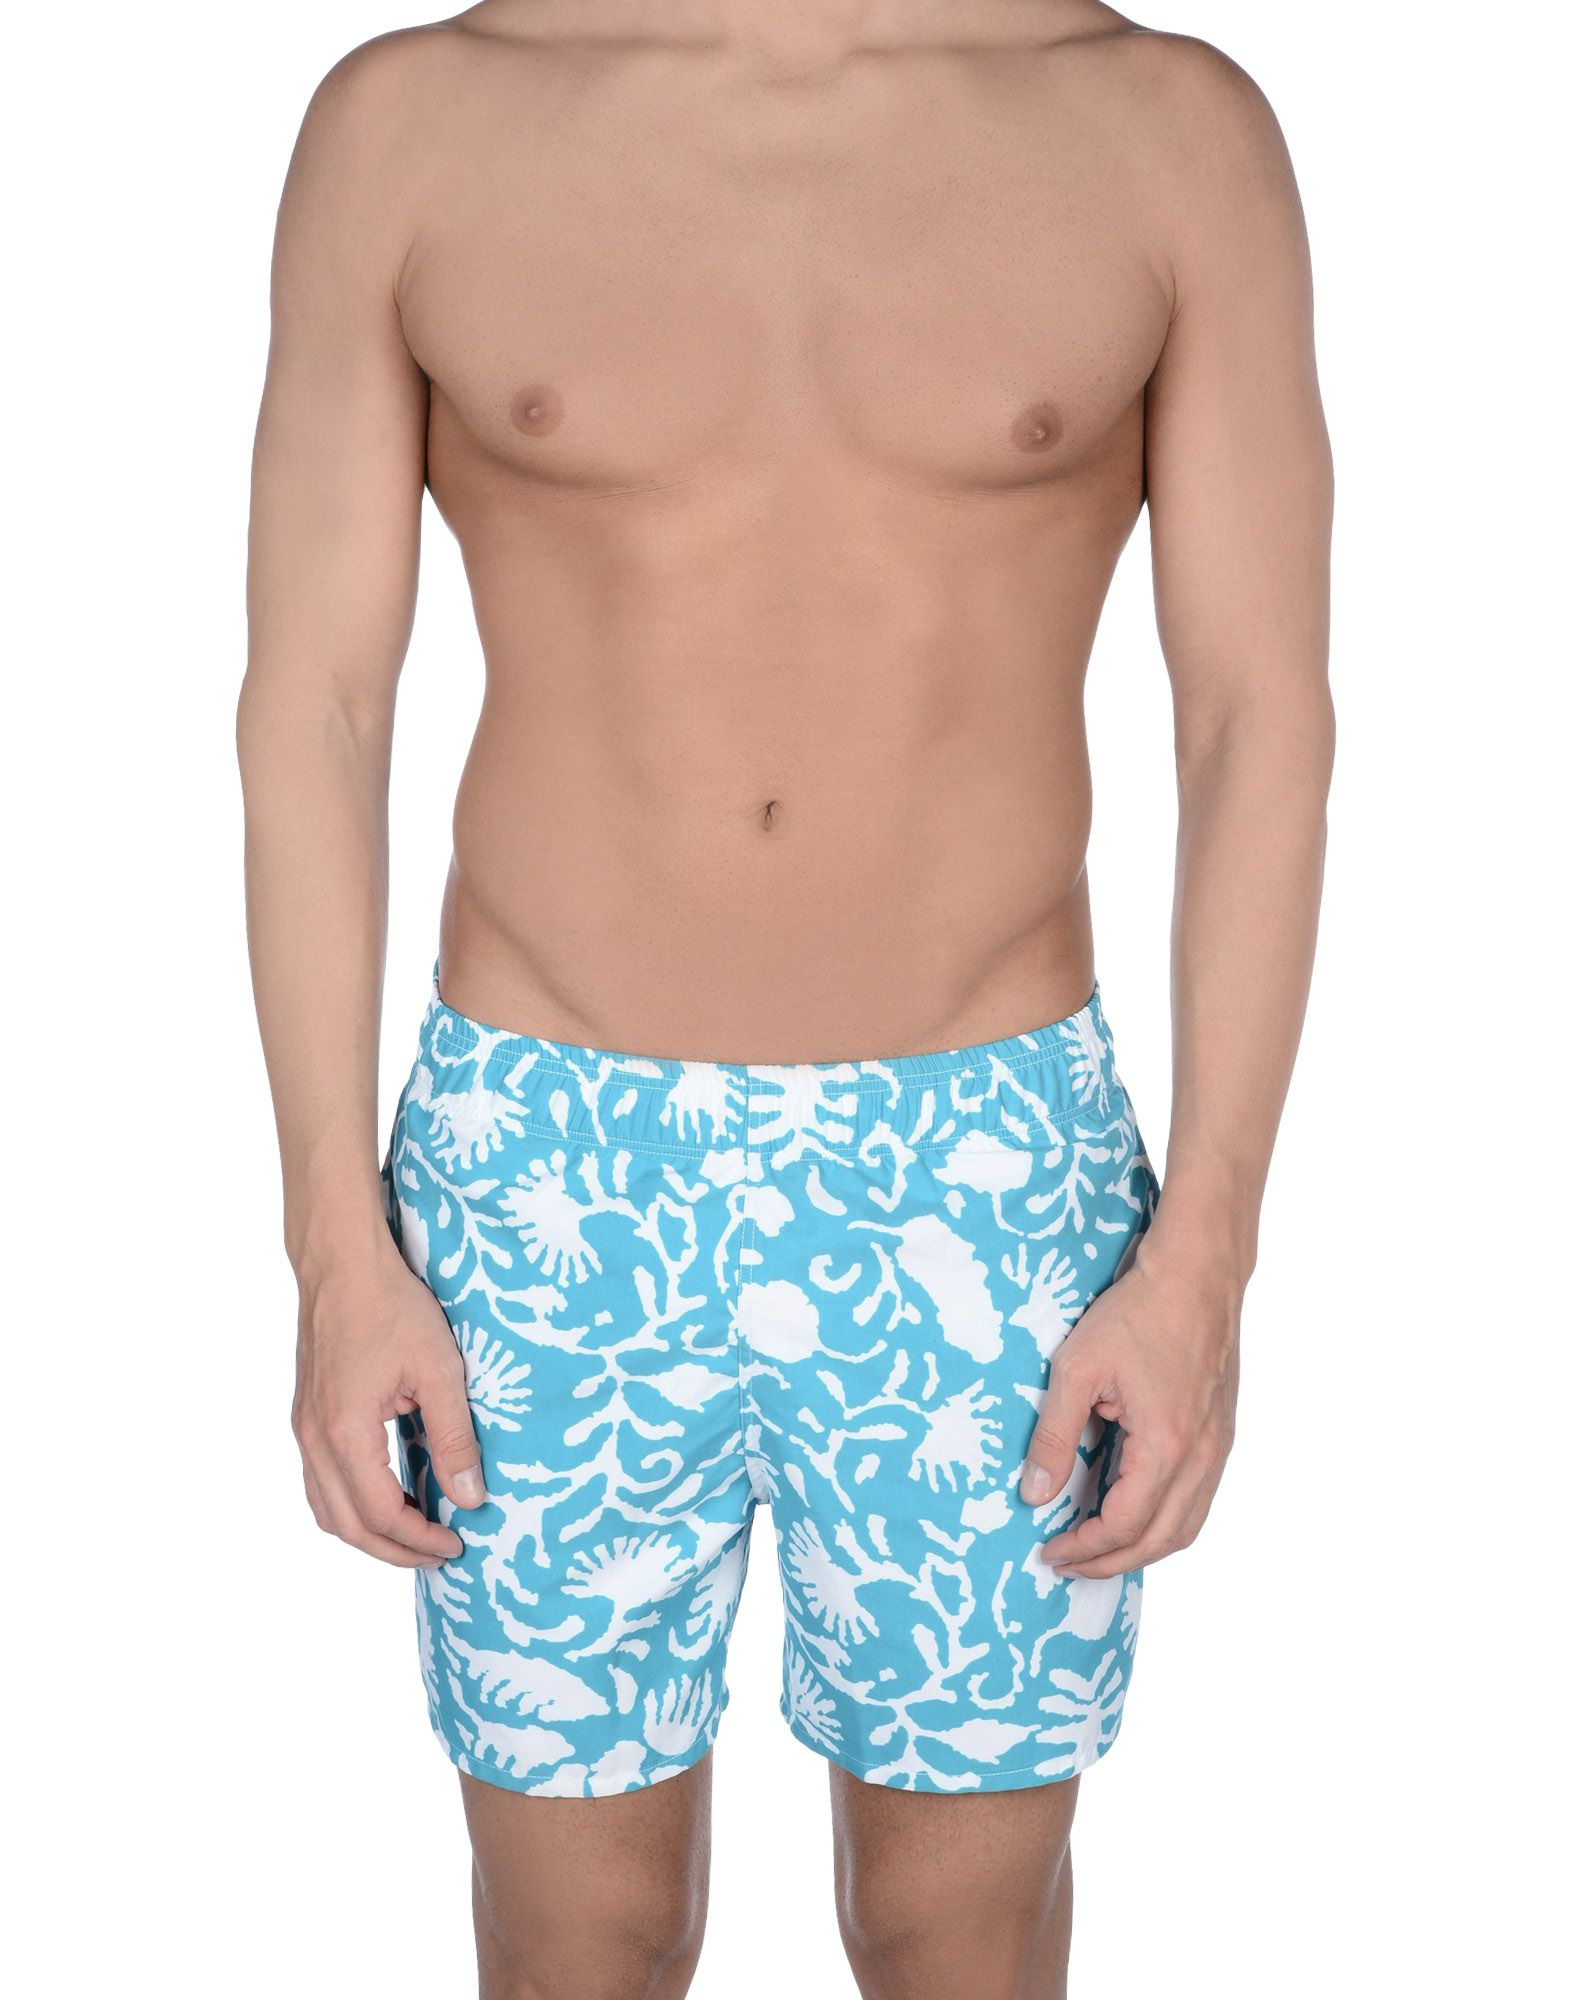 3119f6101f Lyst - Zegna Sport Swimming Trunks in Blue for Men